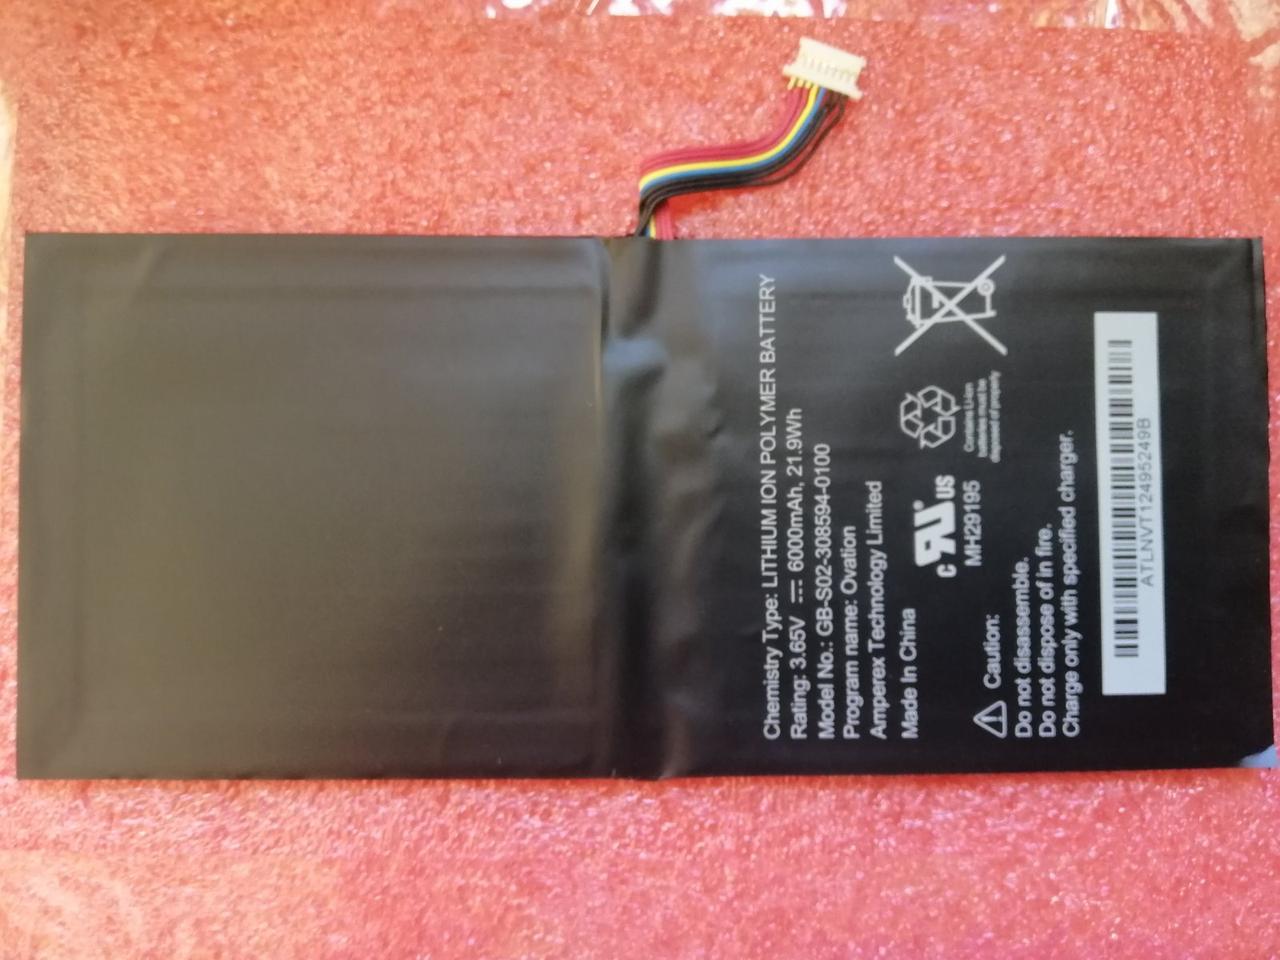 Акумулятор Barnes & Noble AVPB00, AVPB002-A110-01, BNTV600, GB-S02-308594-0100, BNTV600, Nook HD+ Plus, NOOK